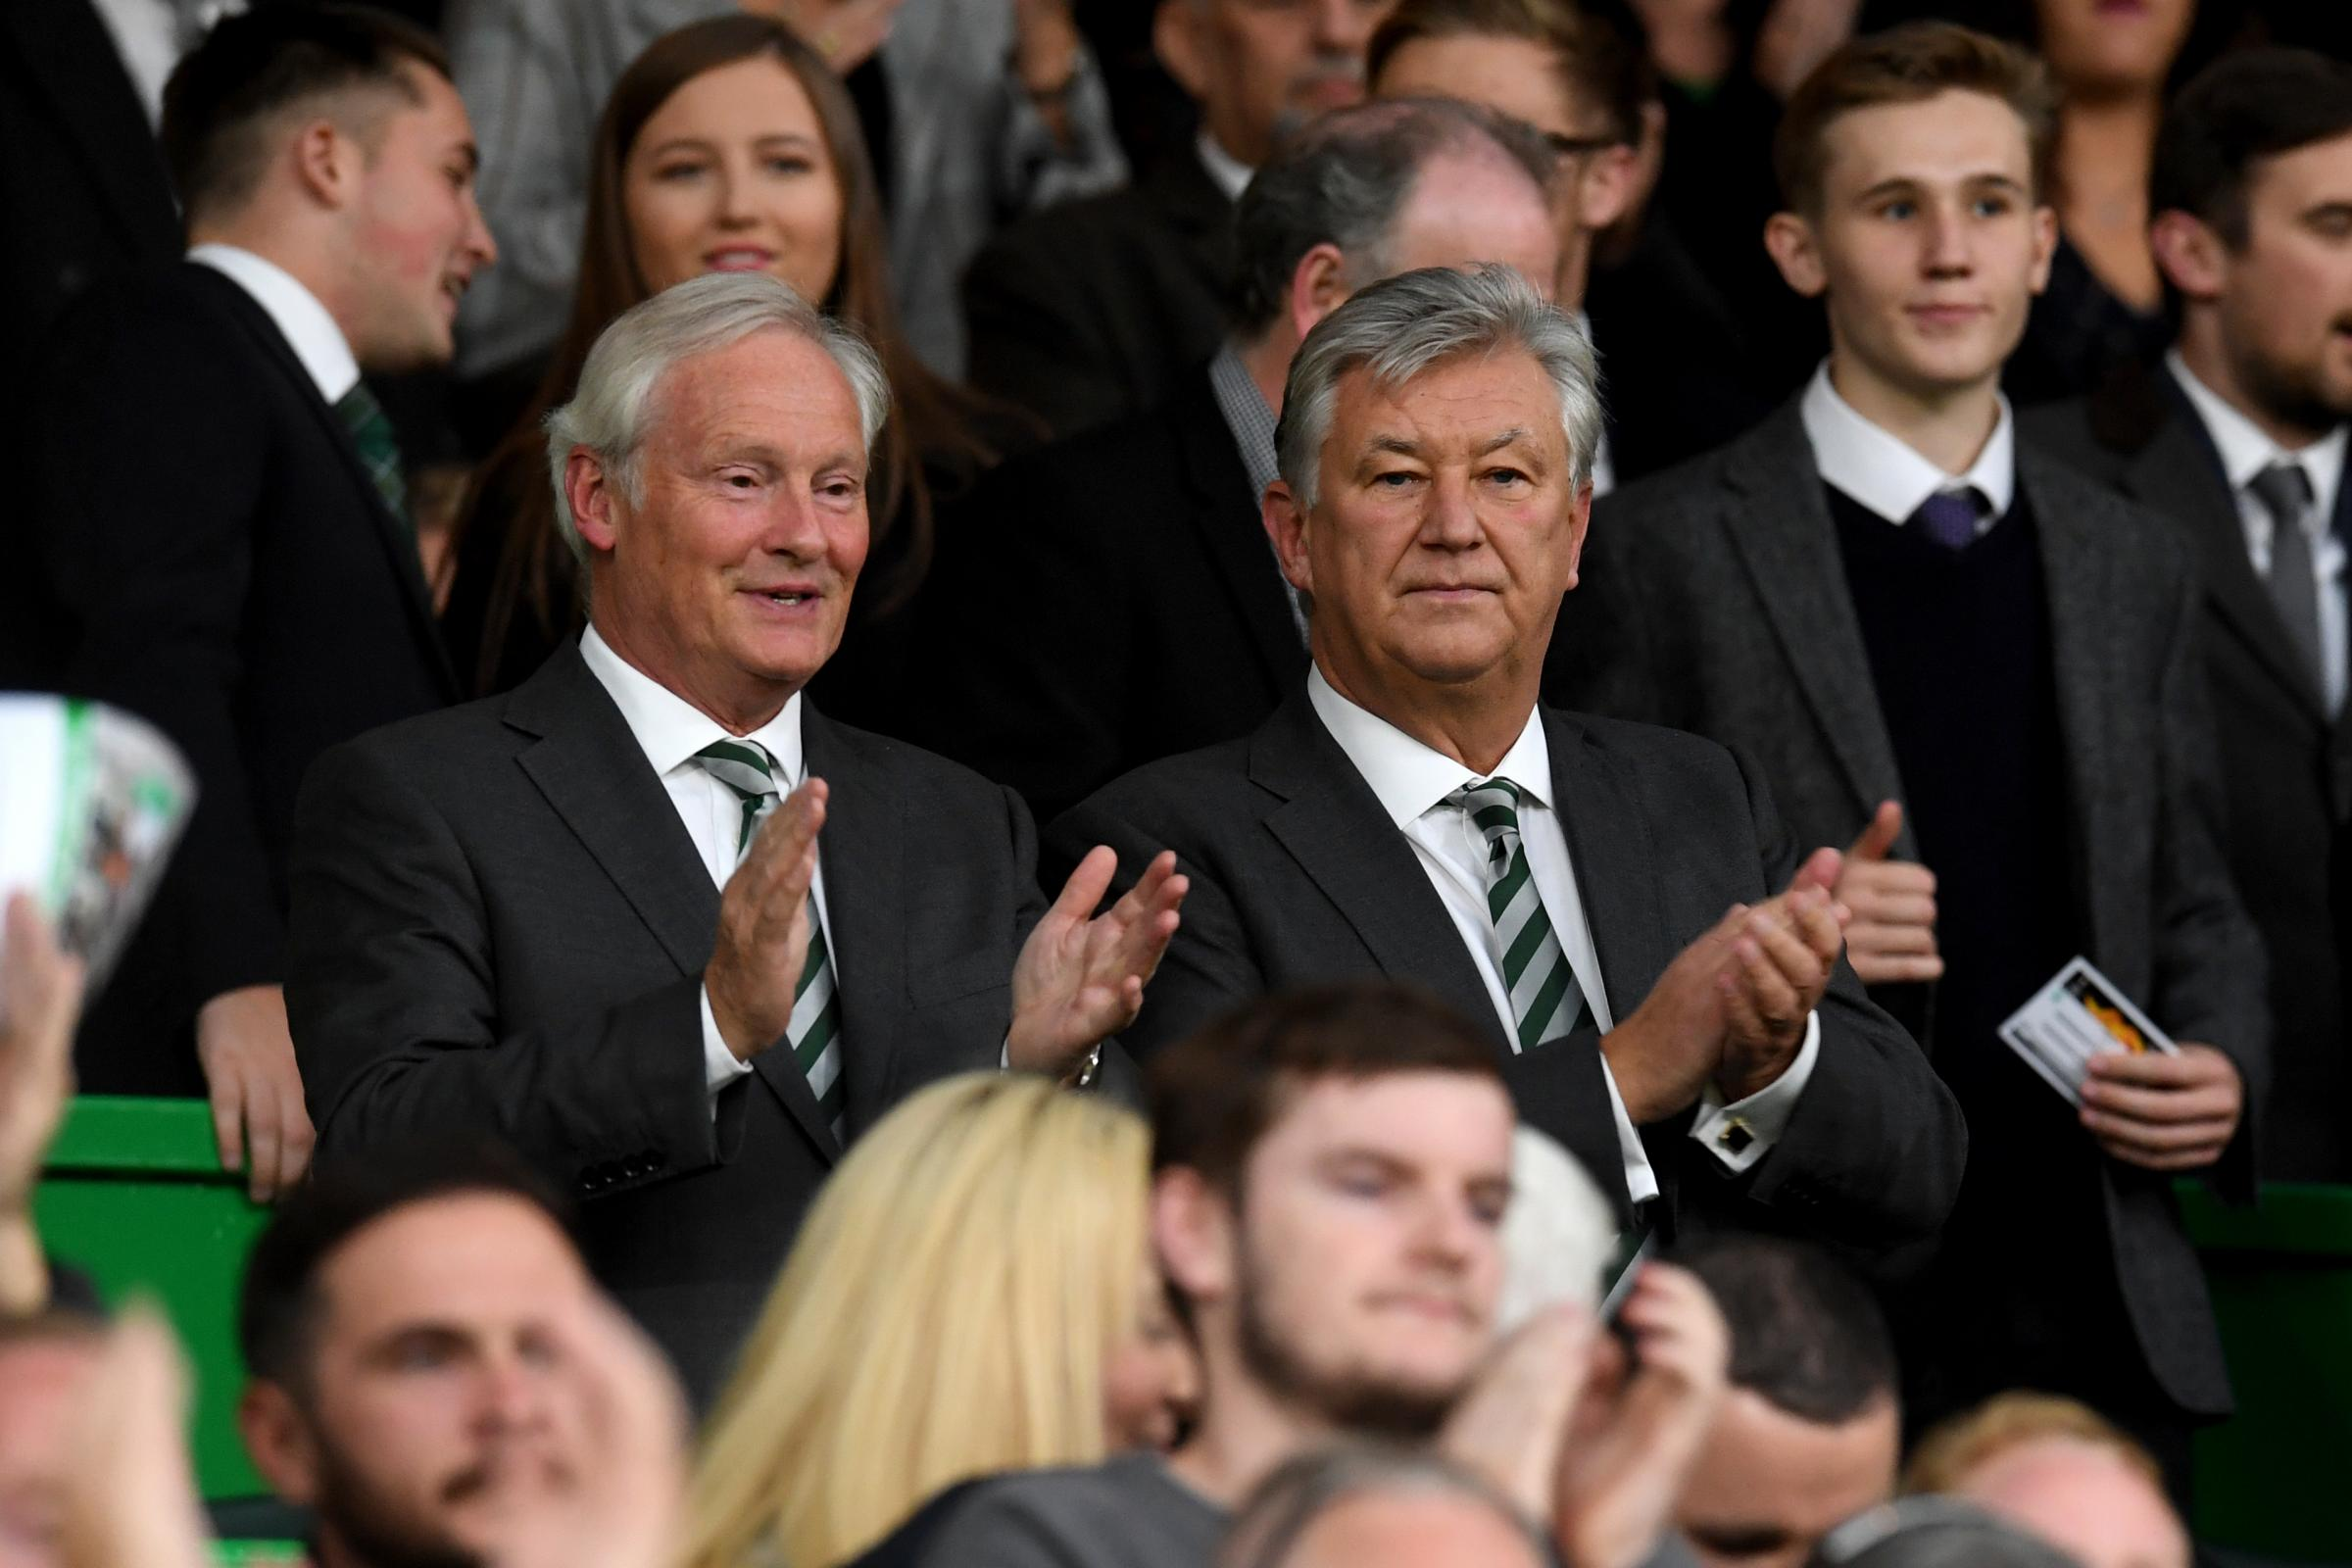 Celtic's interim financial results show club made £18.8 million pre-tax profit last year